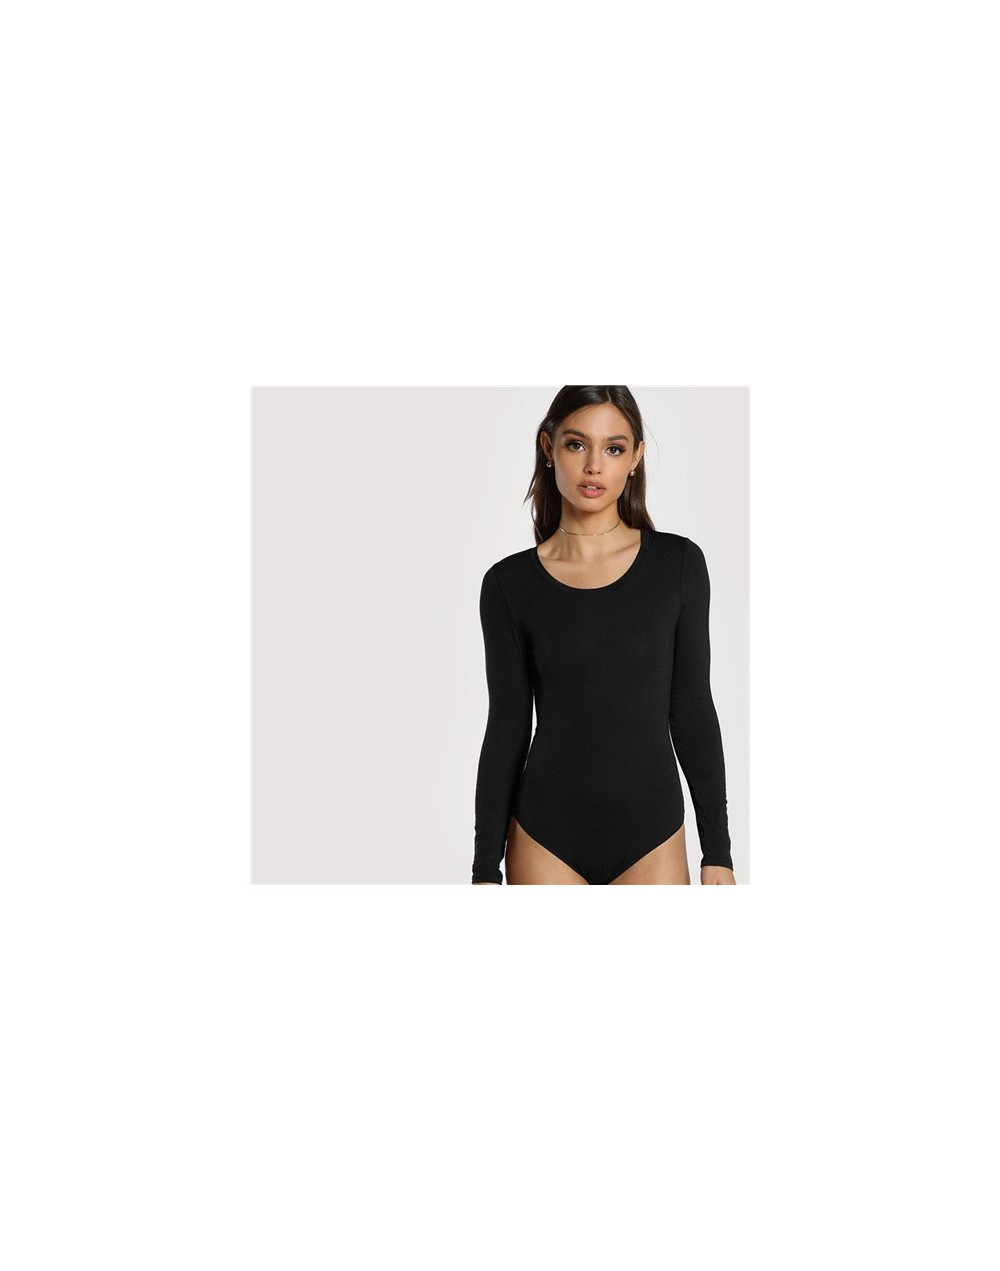 Black Office Lady Casual Scoop Neck Long Sleeve Mid Waist Skinny Solid Bodysuit 2018 Autumn Workwear Women Bodysuits - Black...